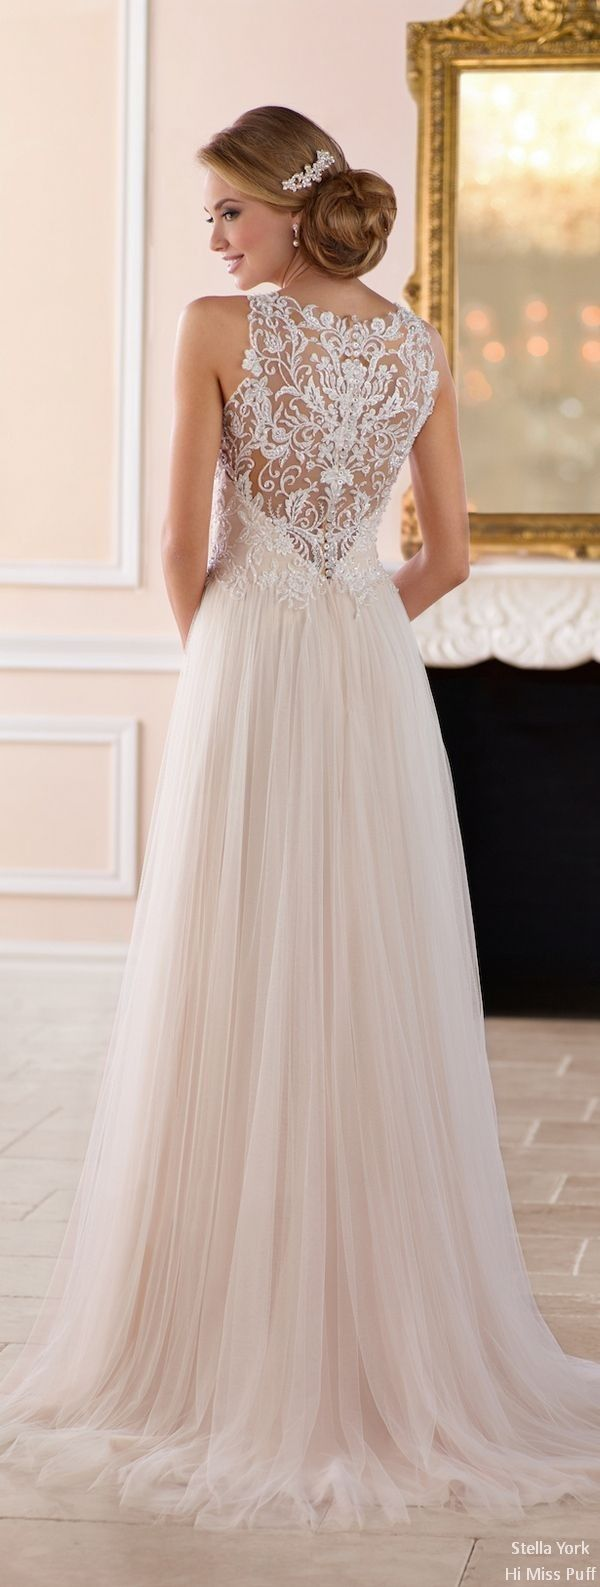 Pin by Kim Jones on I Do | Pinterest | Wedding dress, Wedding and ...